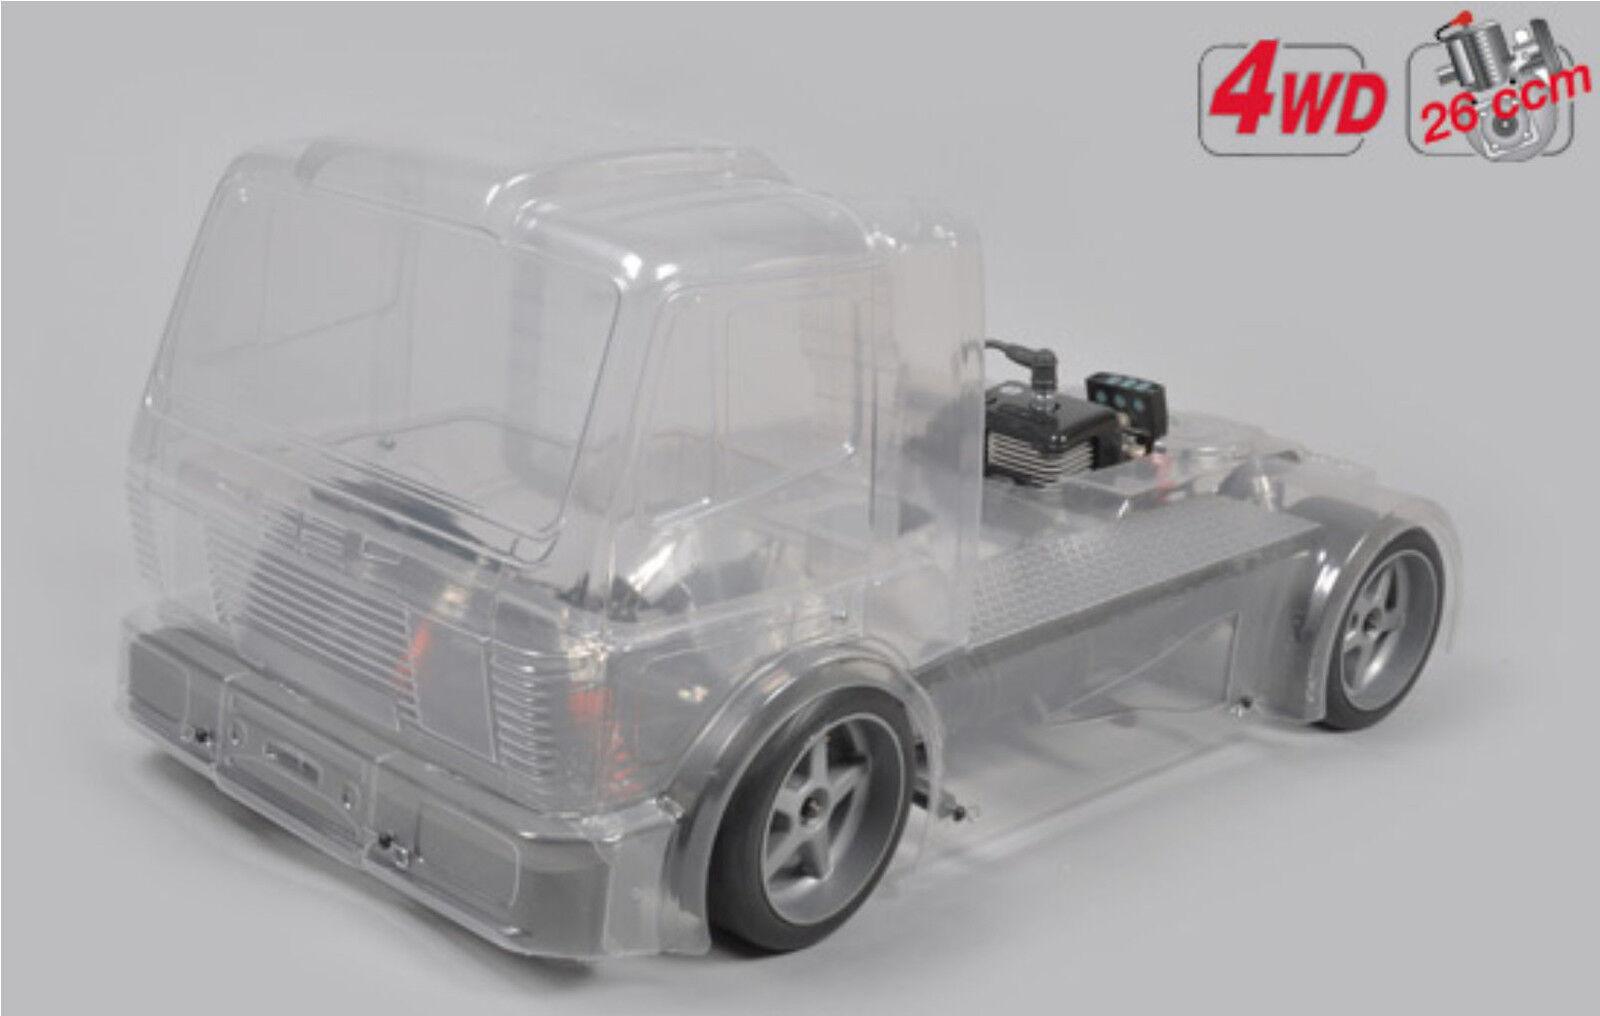 FG modelo Sport Street Truck 530 4wd sin pintar 26ccm sin control remoto